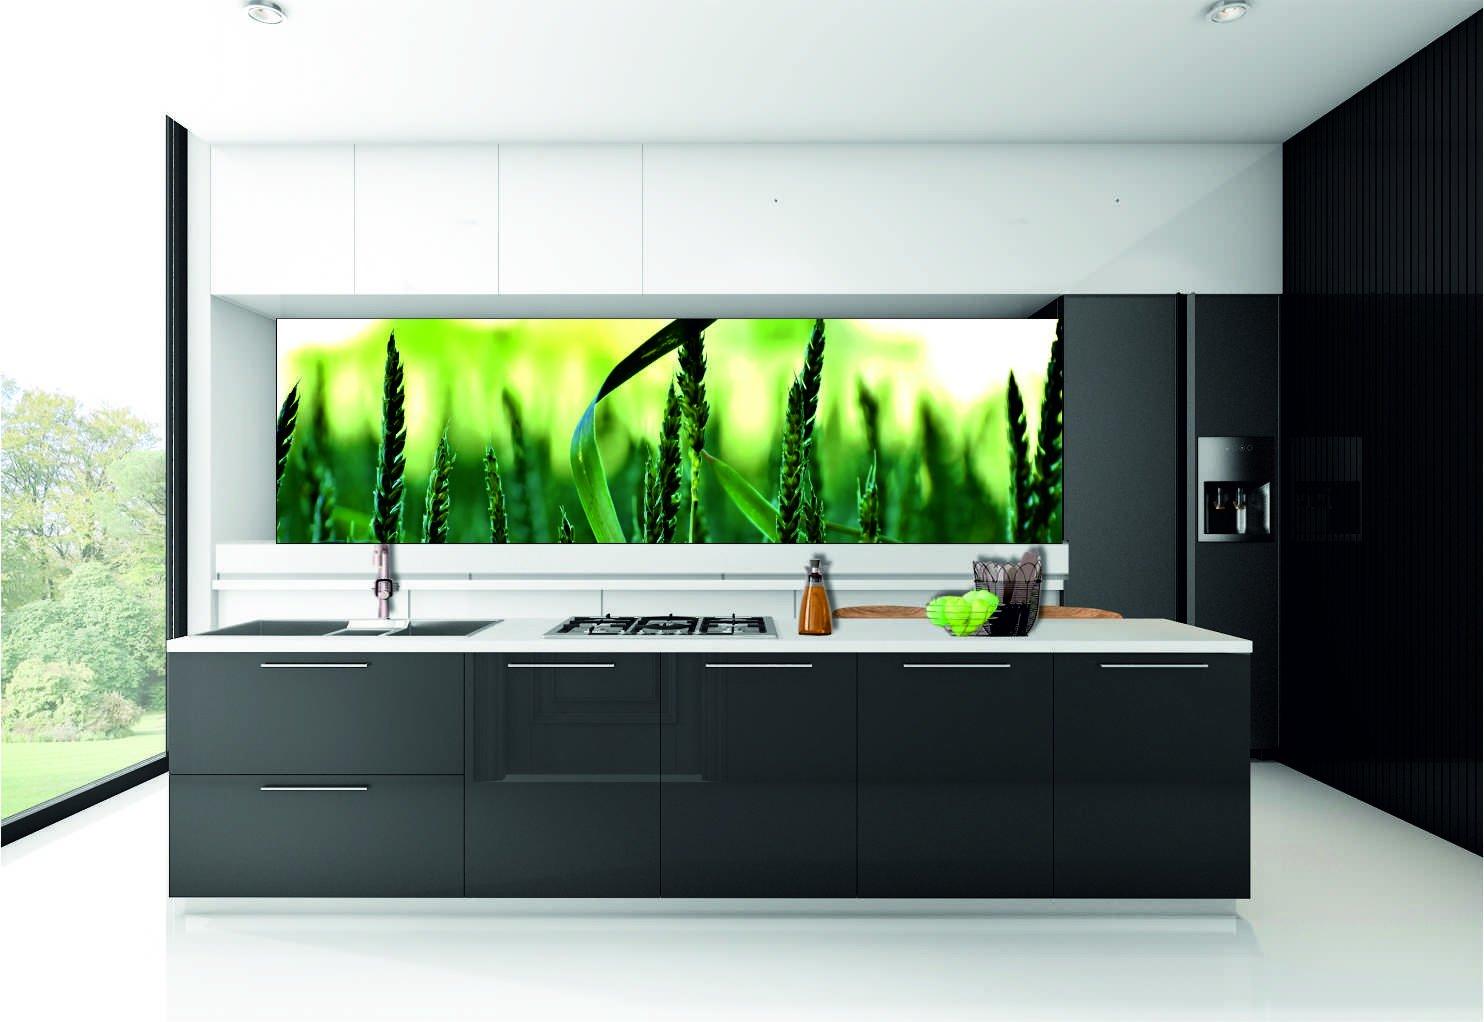 KÜCHENRÜCKWAND Folie selbstklebend Klebefolie  Landschaft Natur Getreide KFS65